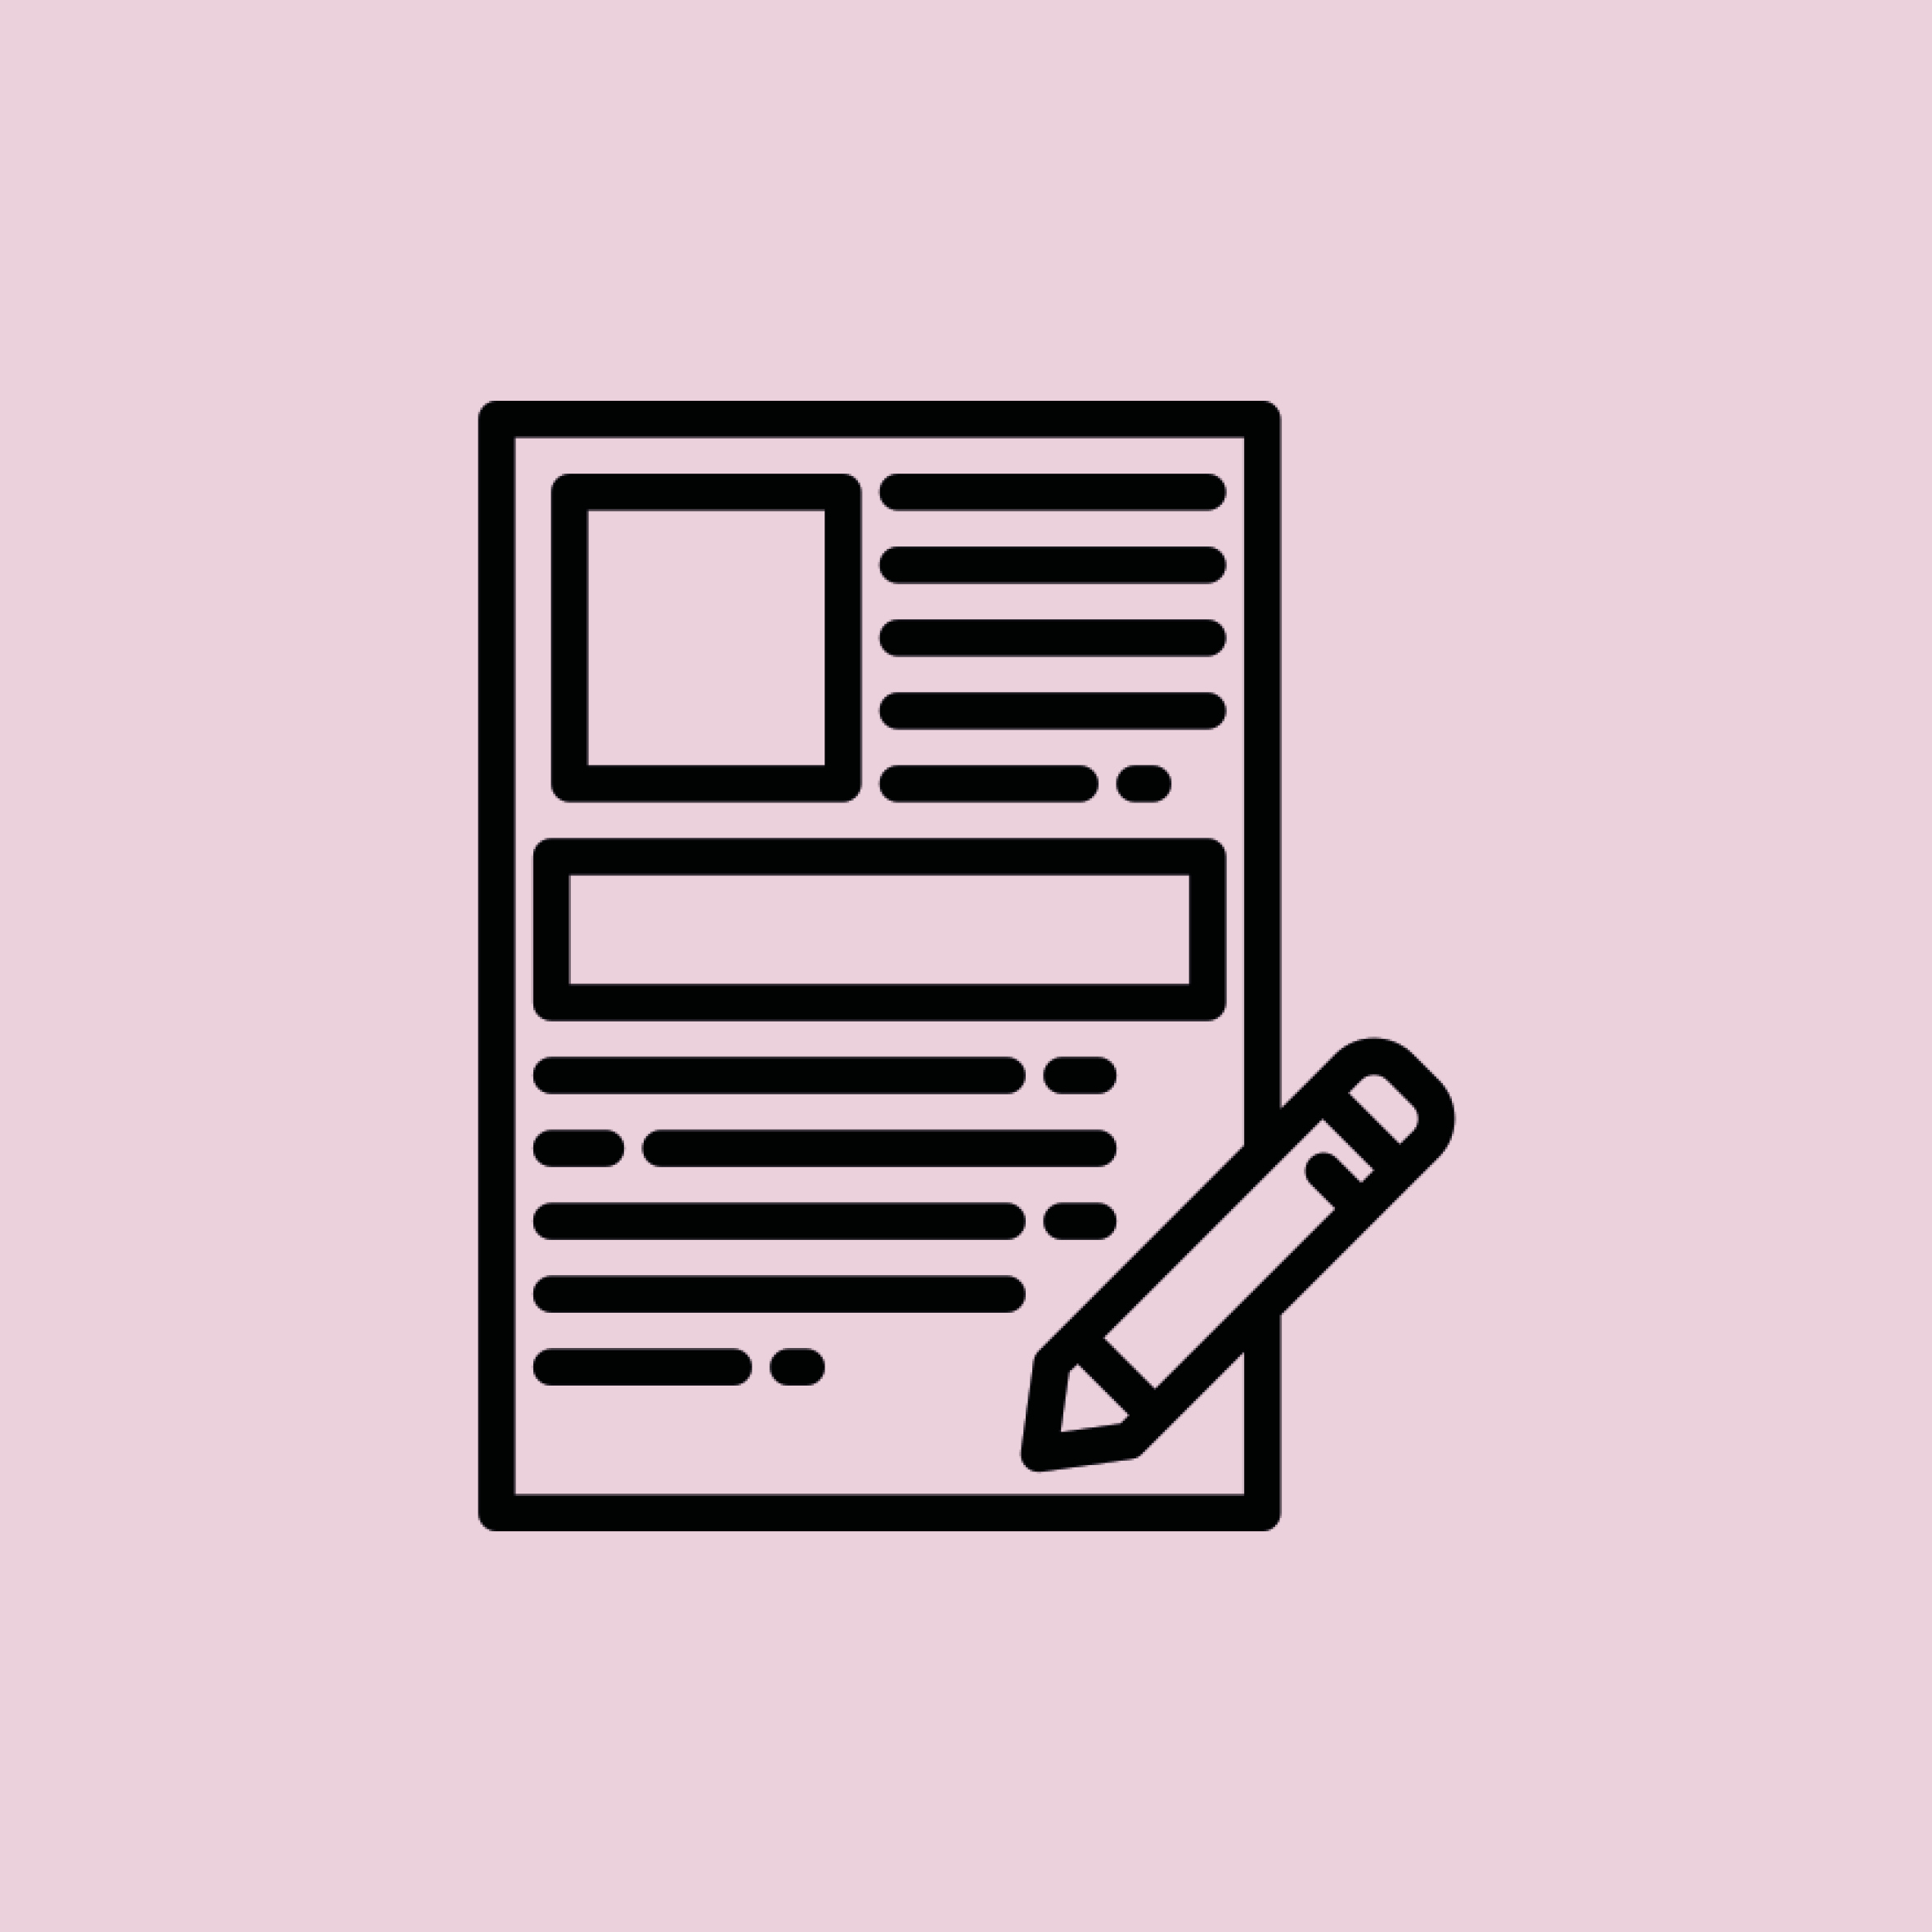 redaktion-texting Piktogramm